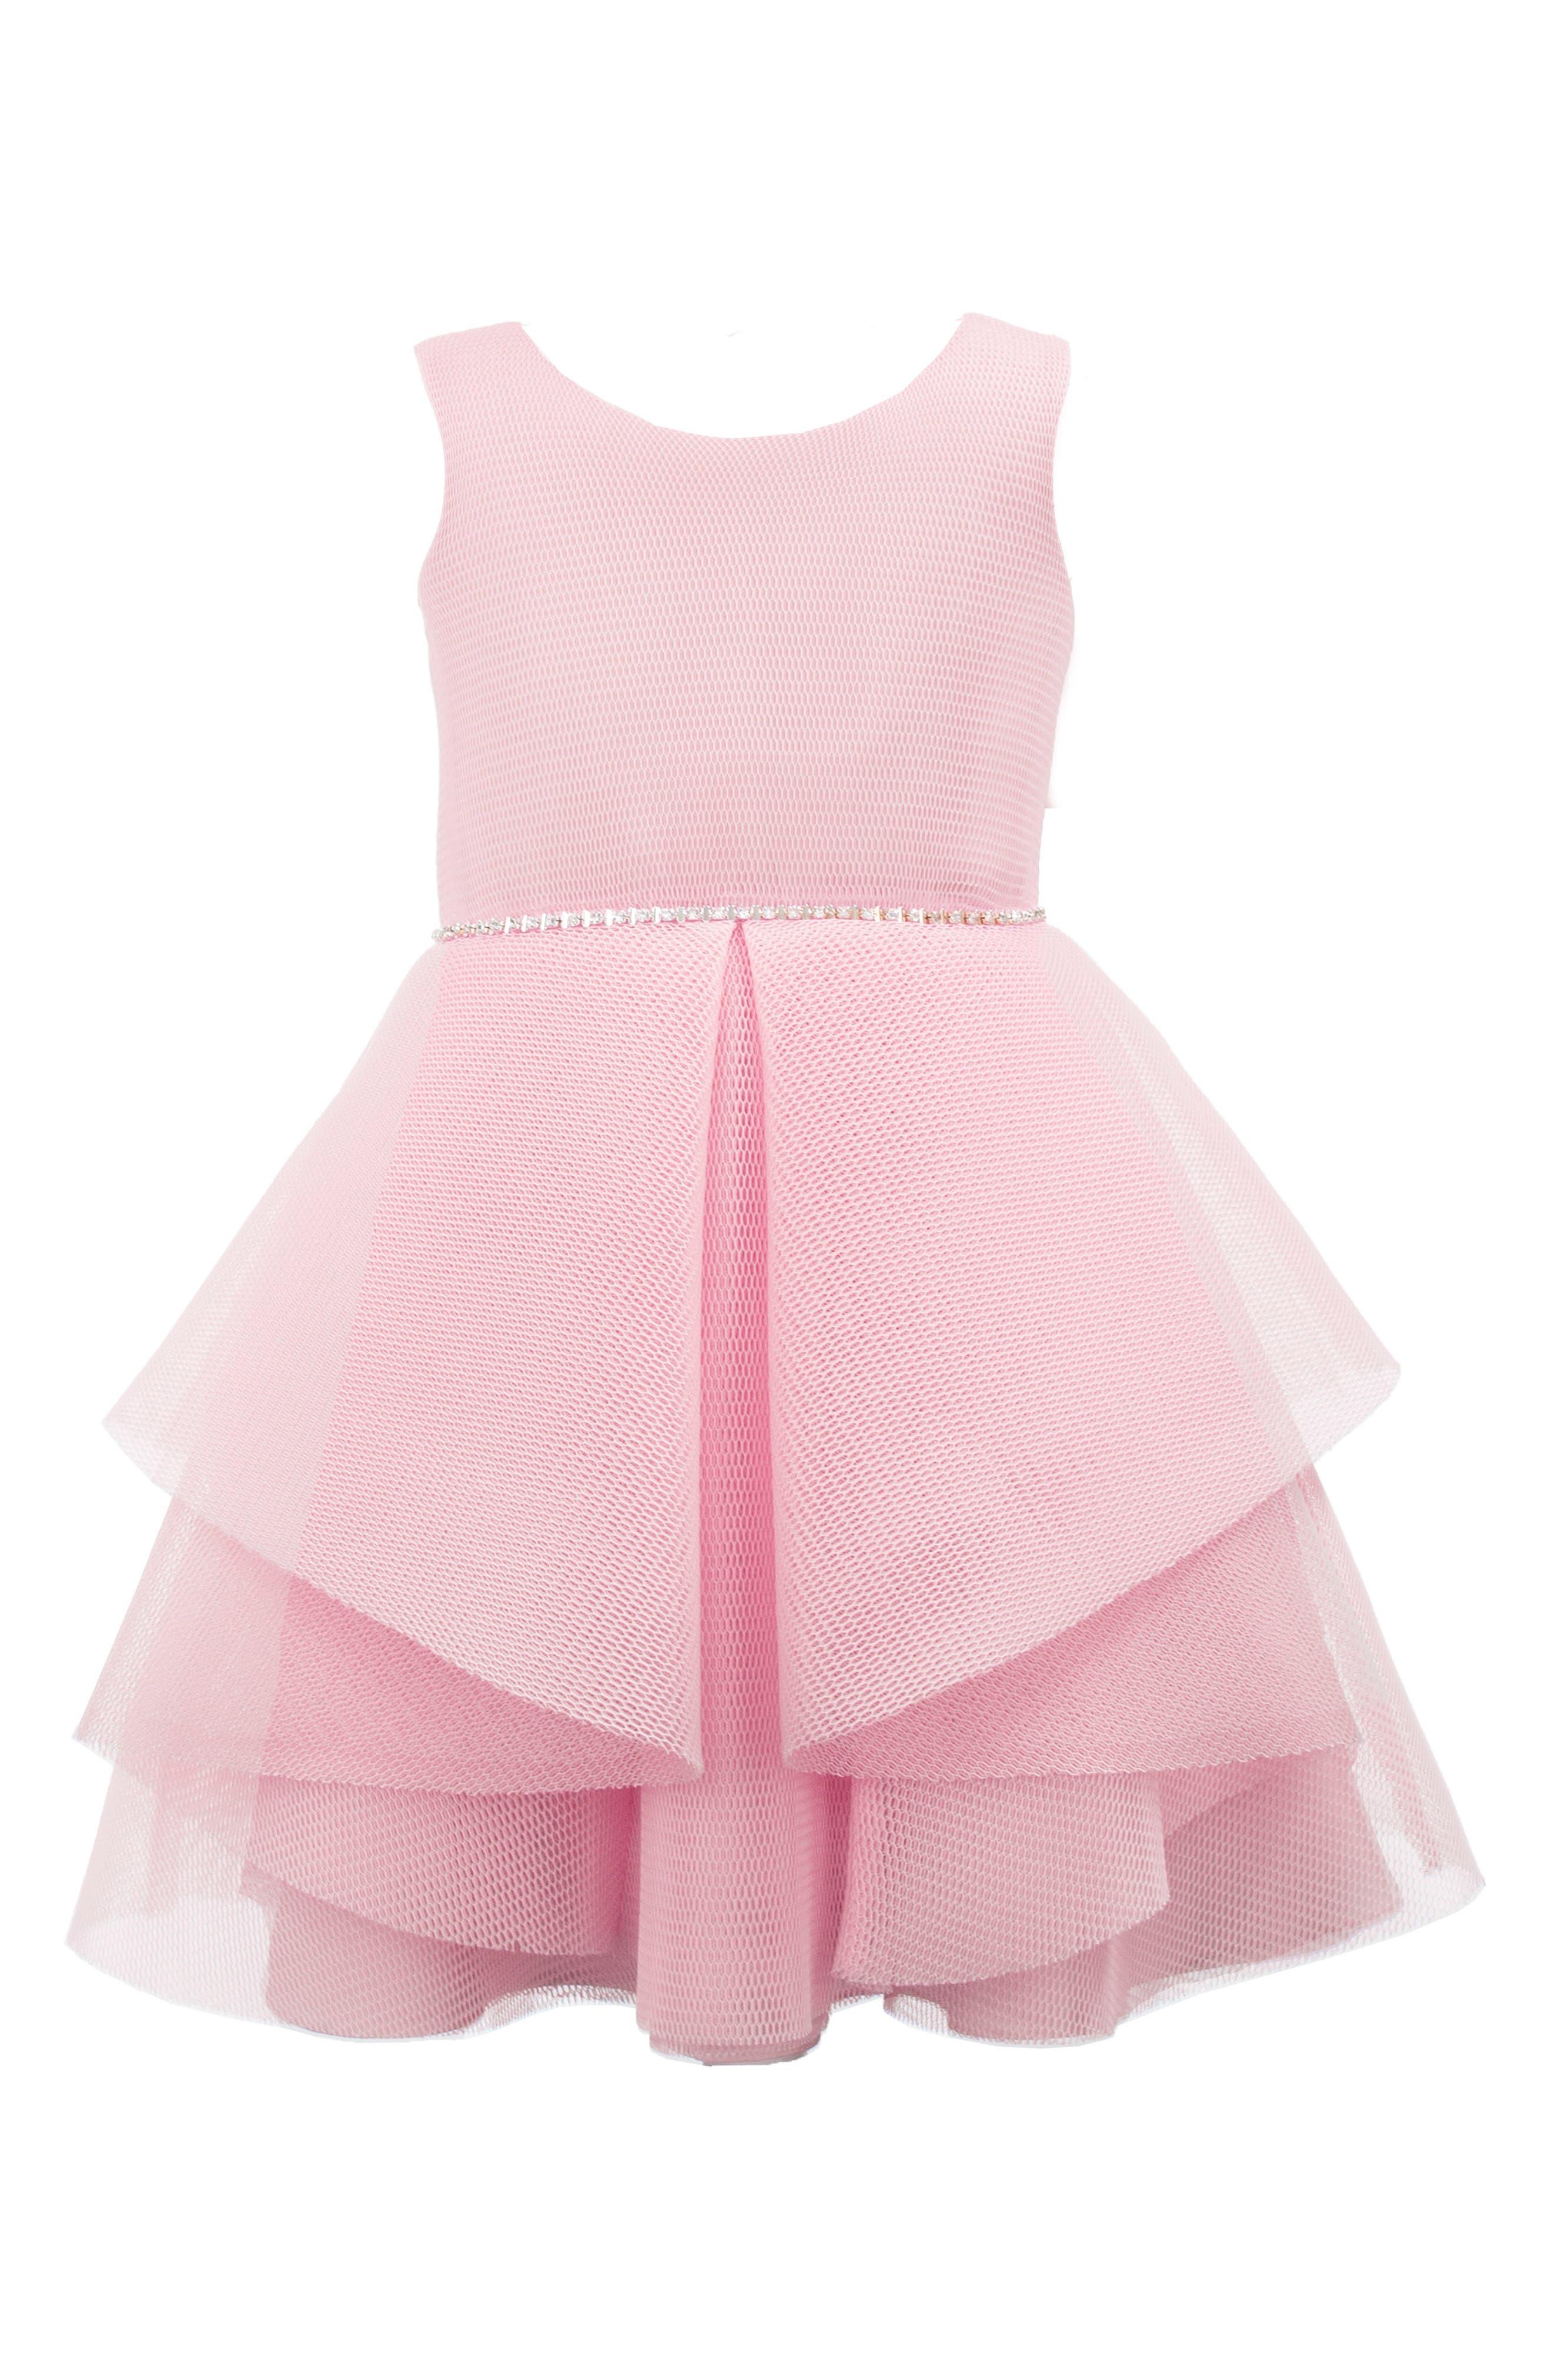 Wrapover Mesh Dress,                             Main thumbnail 1, color,                             Pink